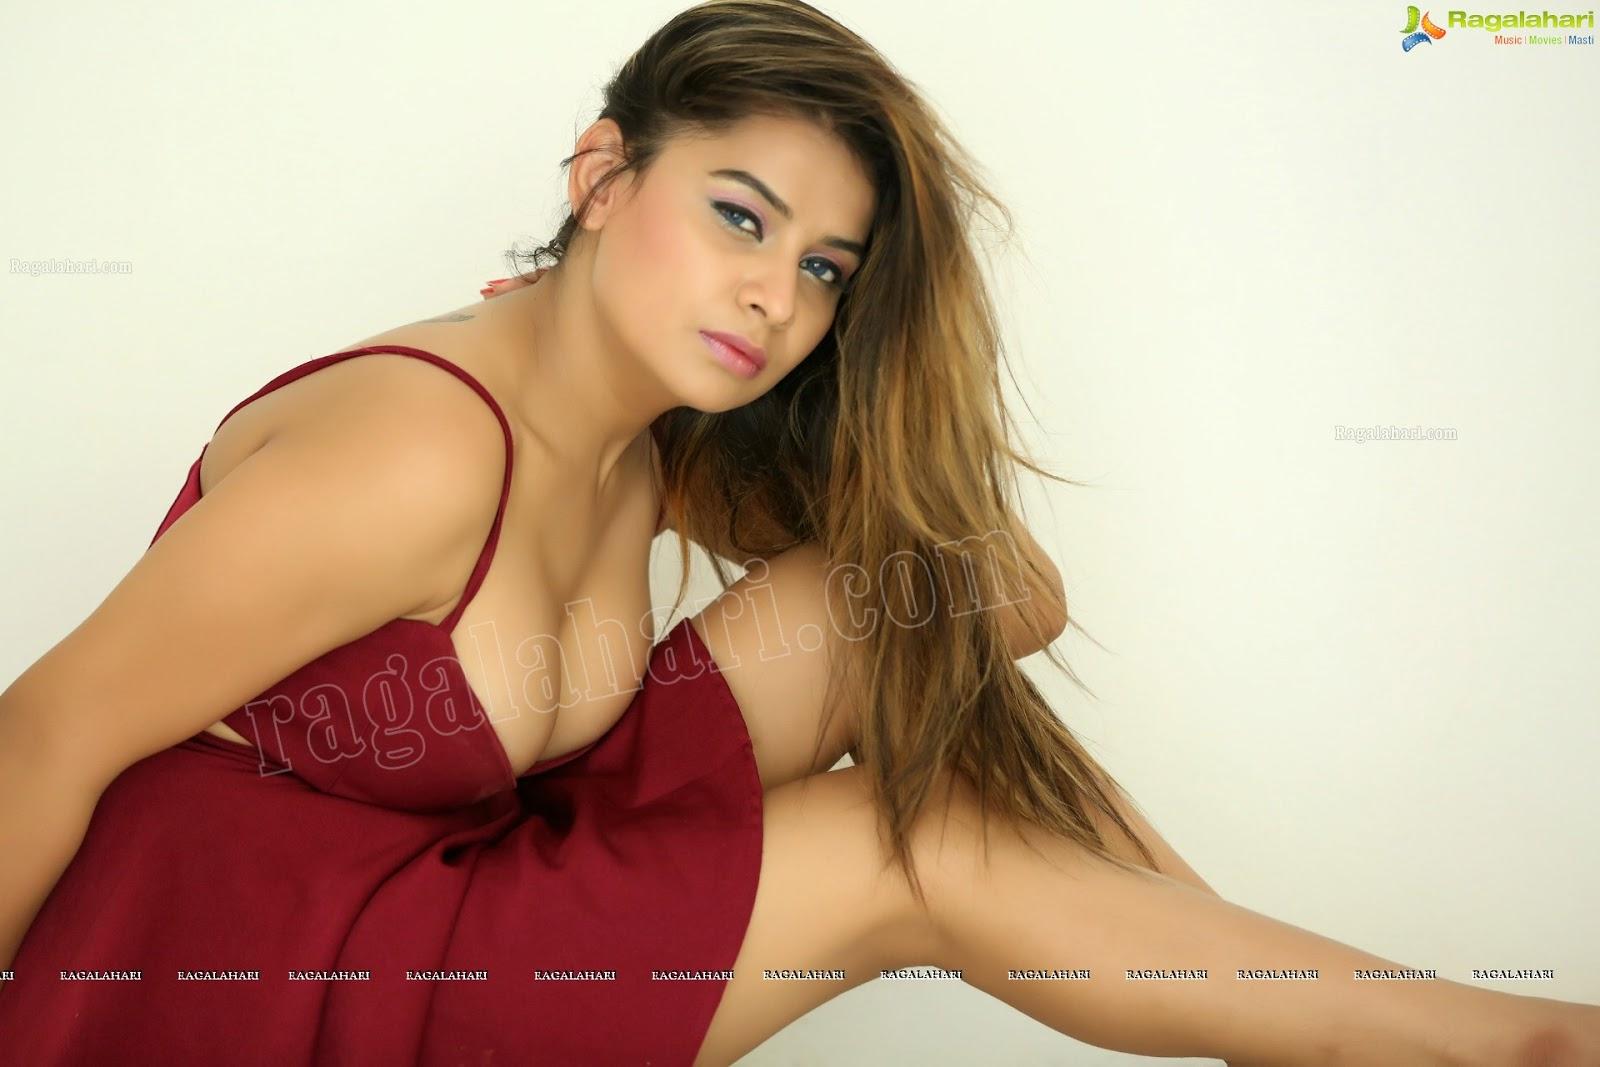 telegu actress super model showing  armpit